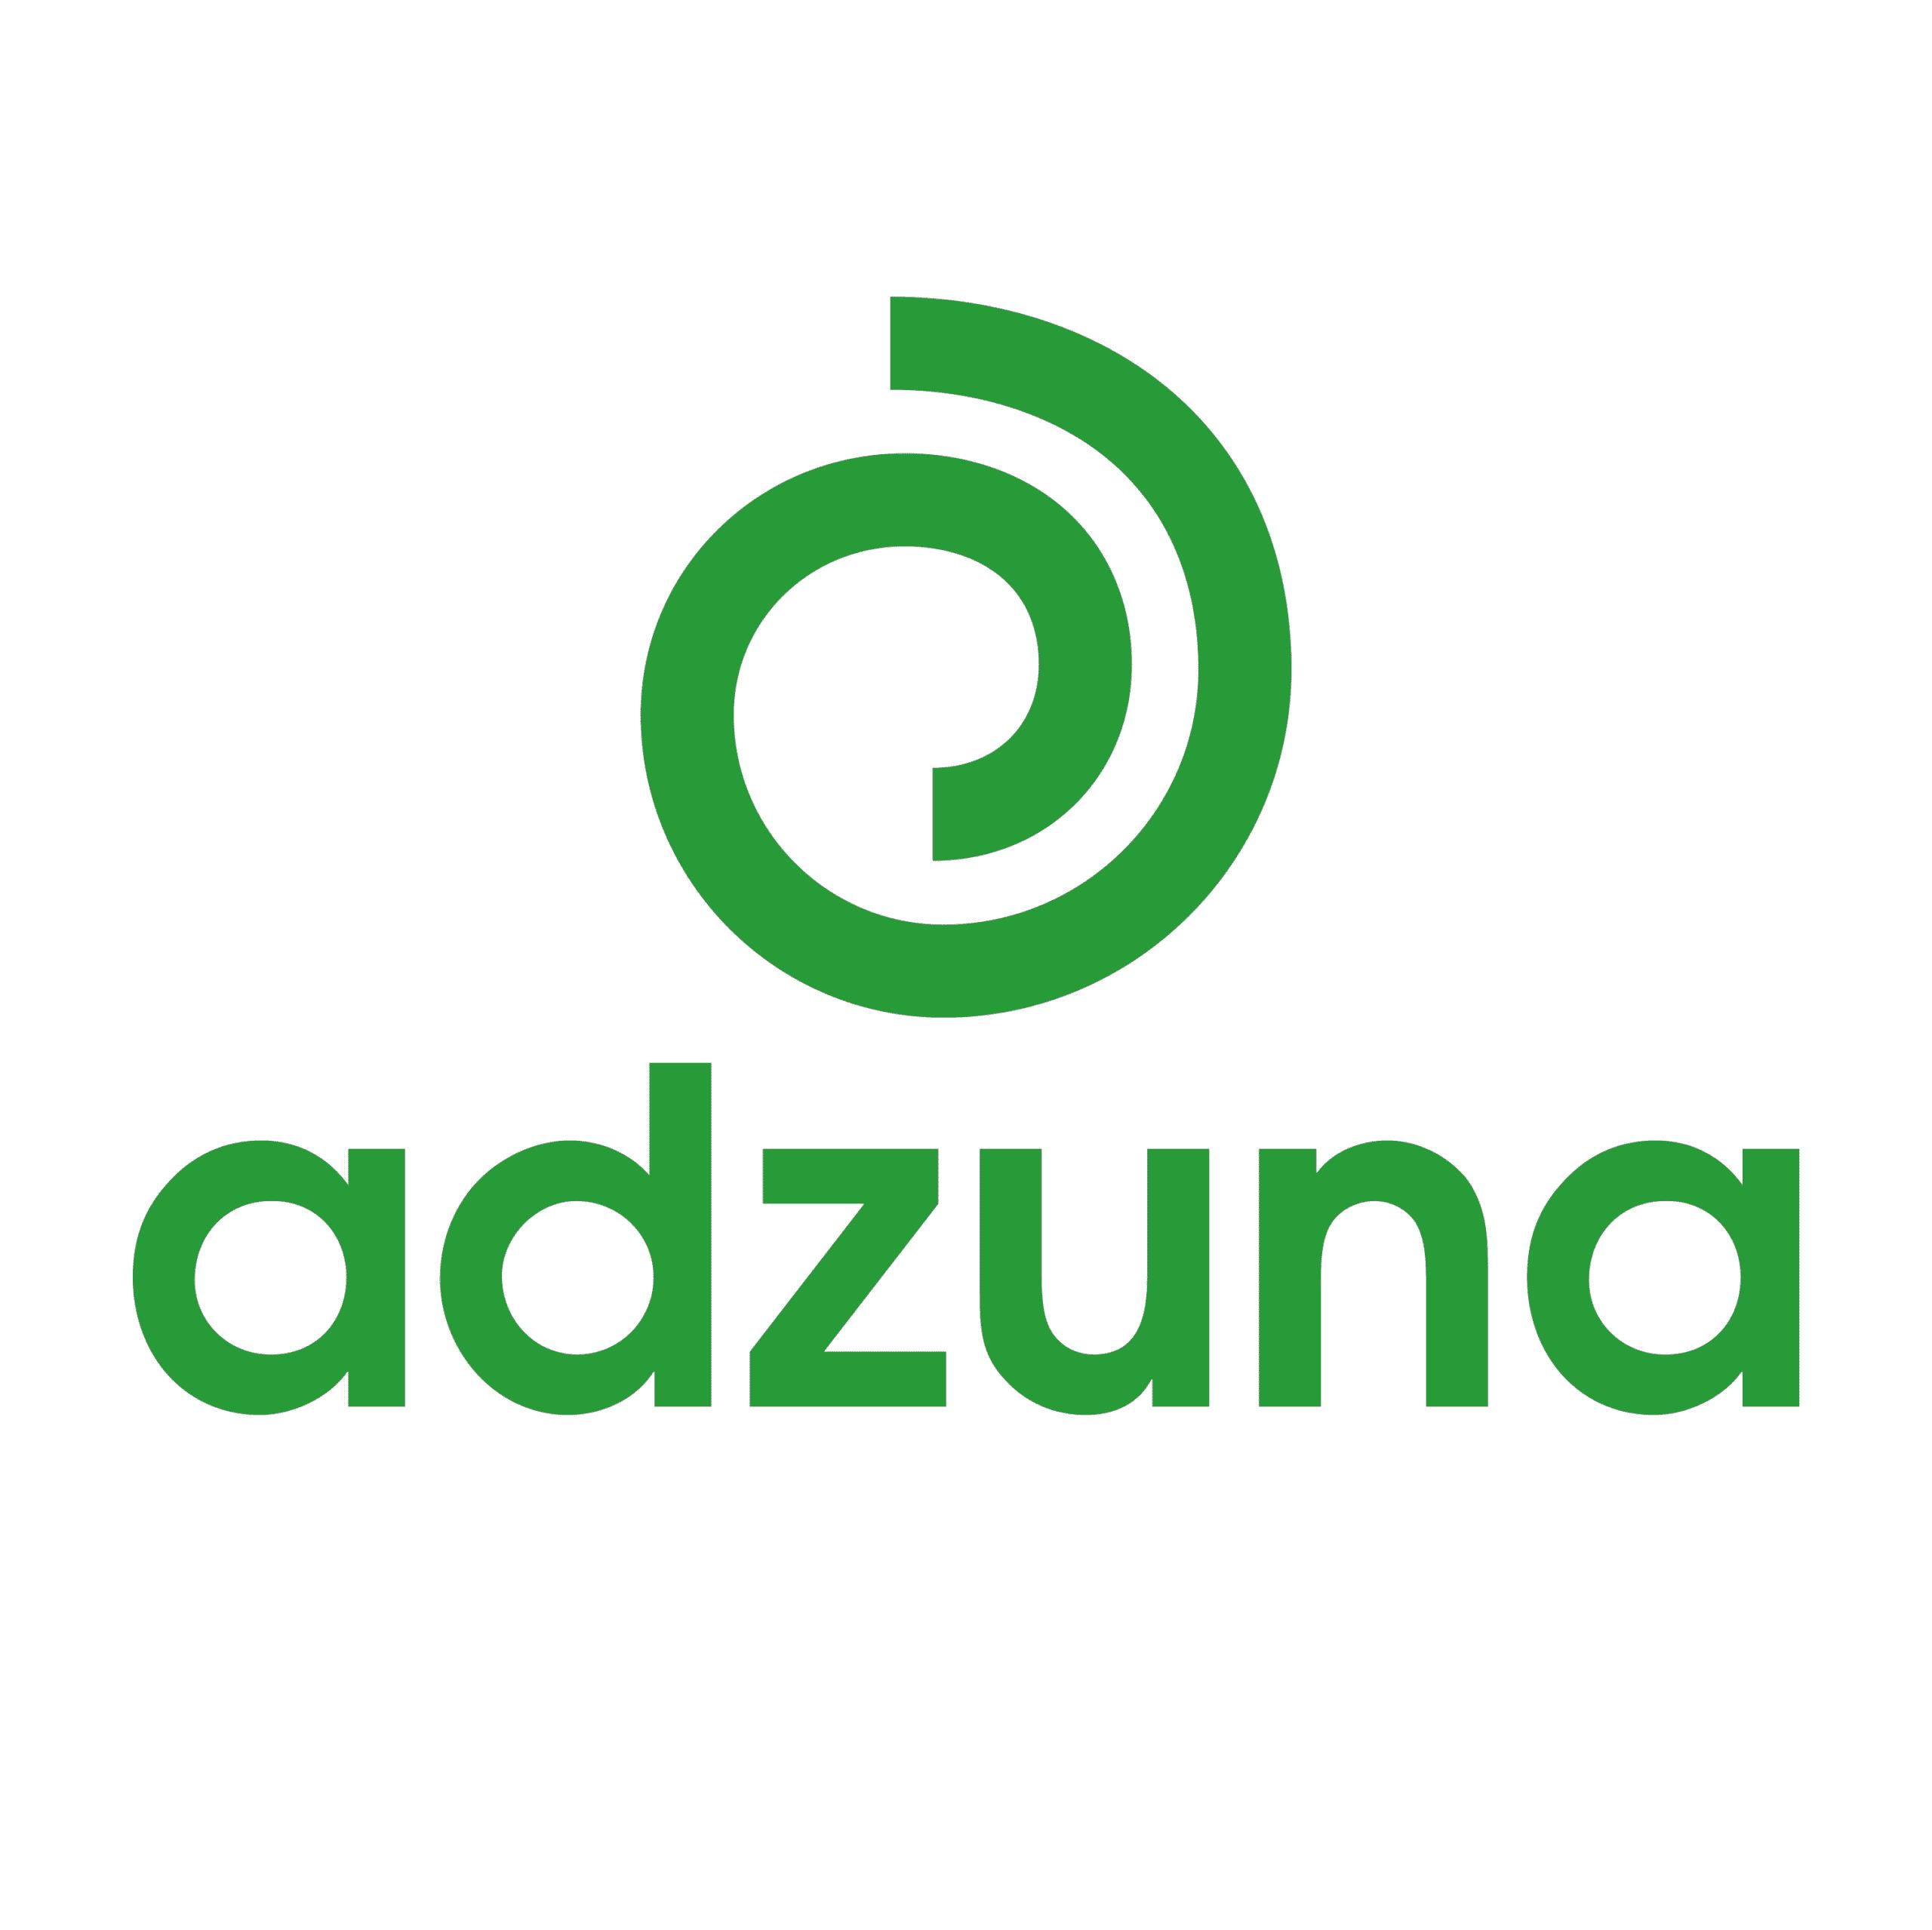 Job Search - Find Every Job, Everywhere with Adzuna